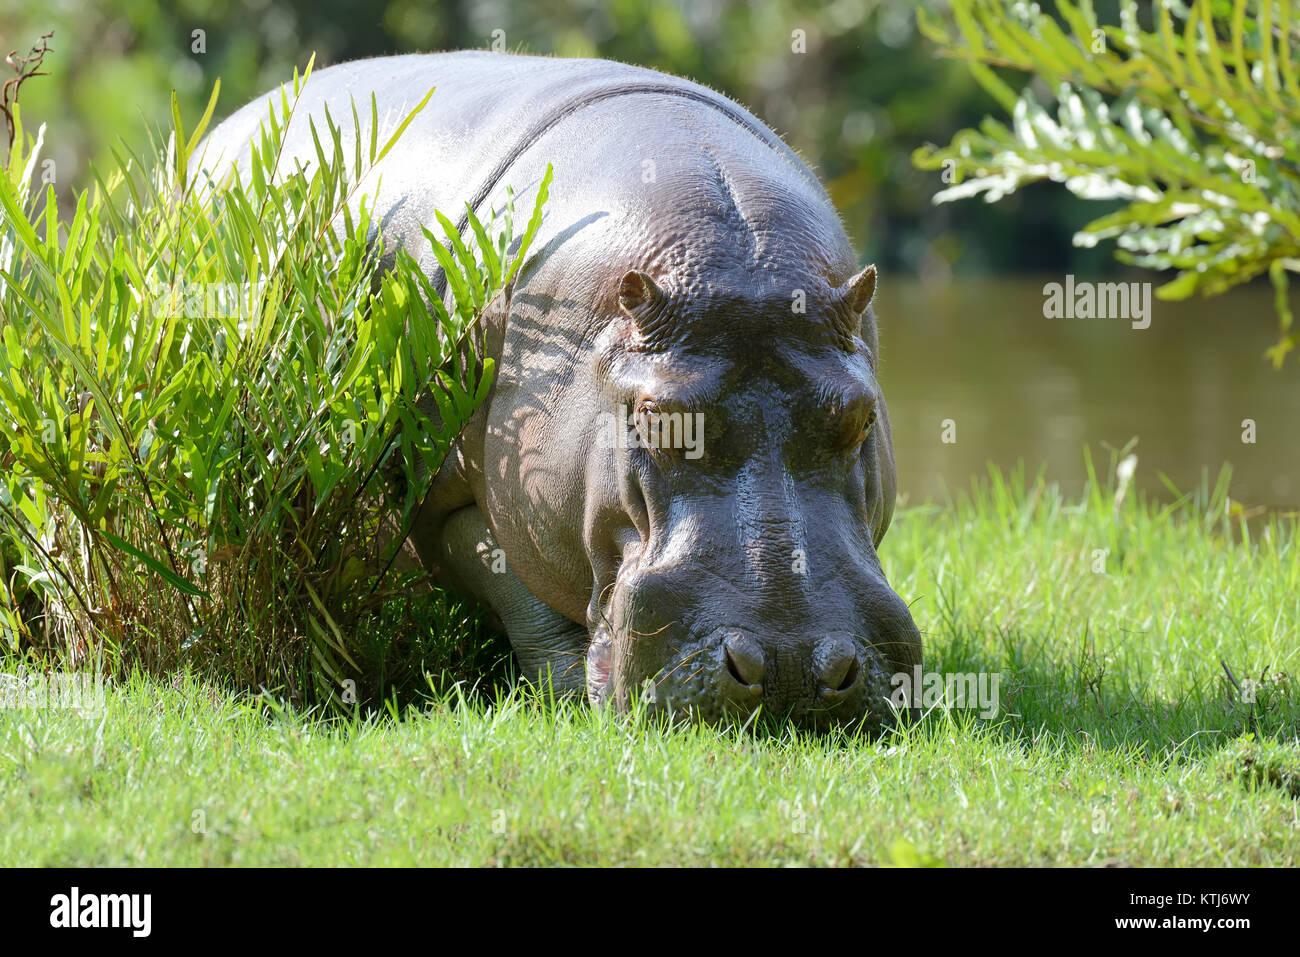 Gran hippo en parque nacional de Kenya, Africa. Imagen De Stock